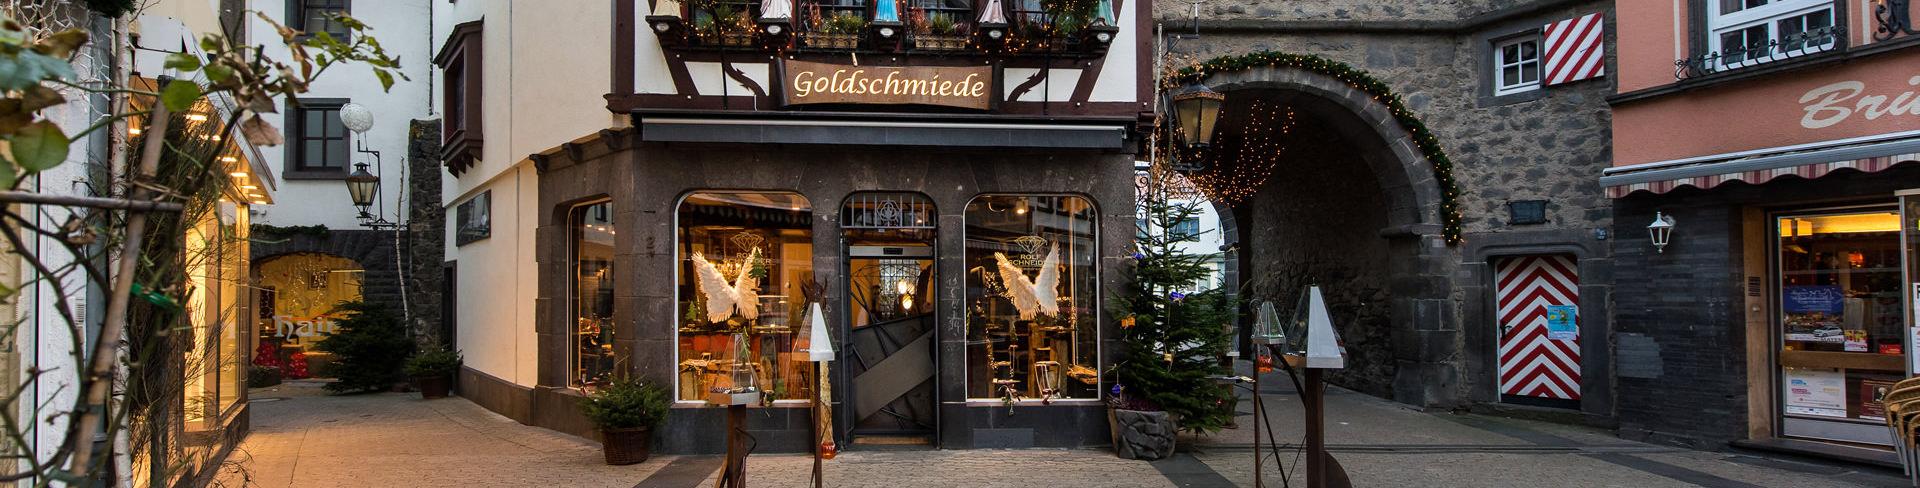 Kontakt Schmuck Goldschmiede Werkstatt